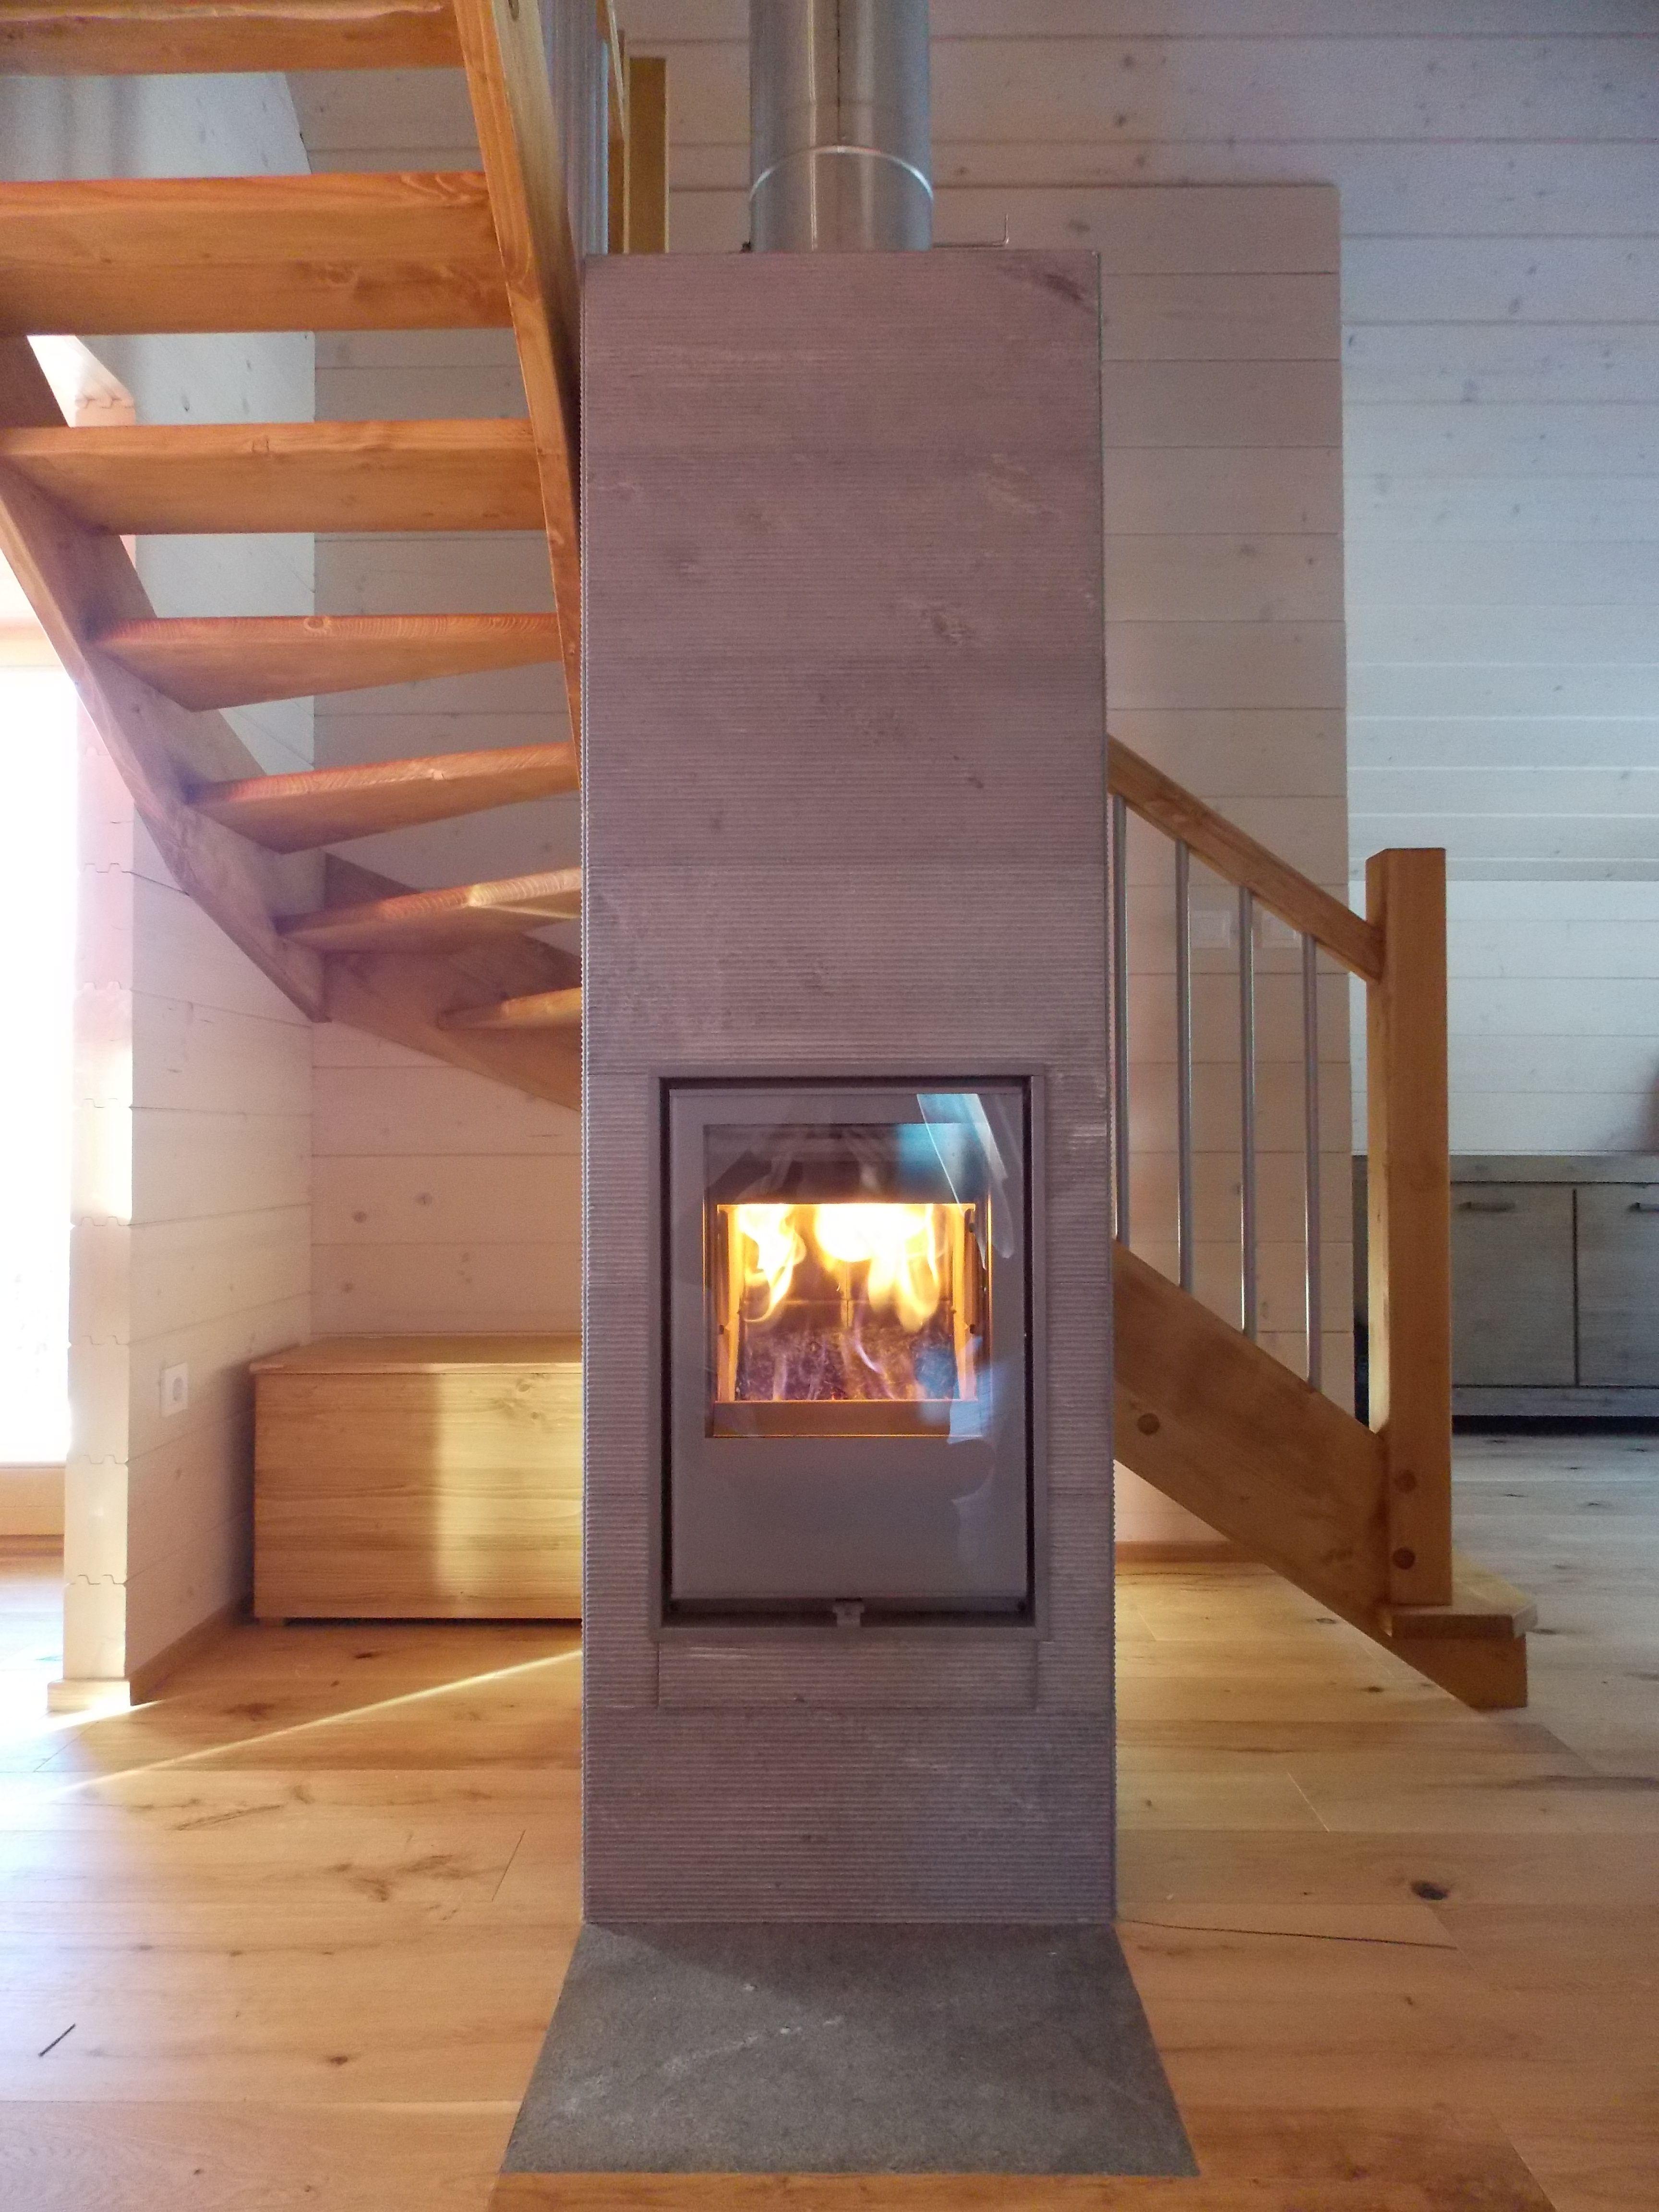 Tulikivi Hiisi Fireplace With Extra Layers Of Heat Retaining Soapstone On Top Slovenia